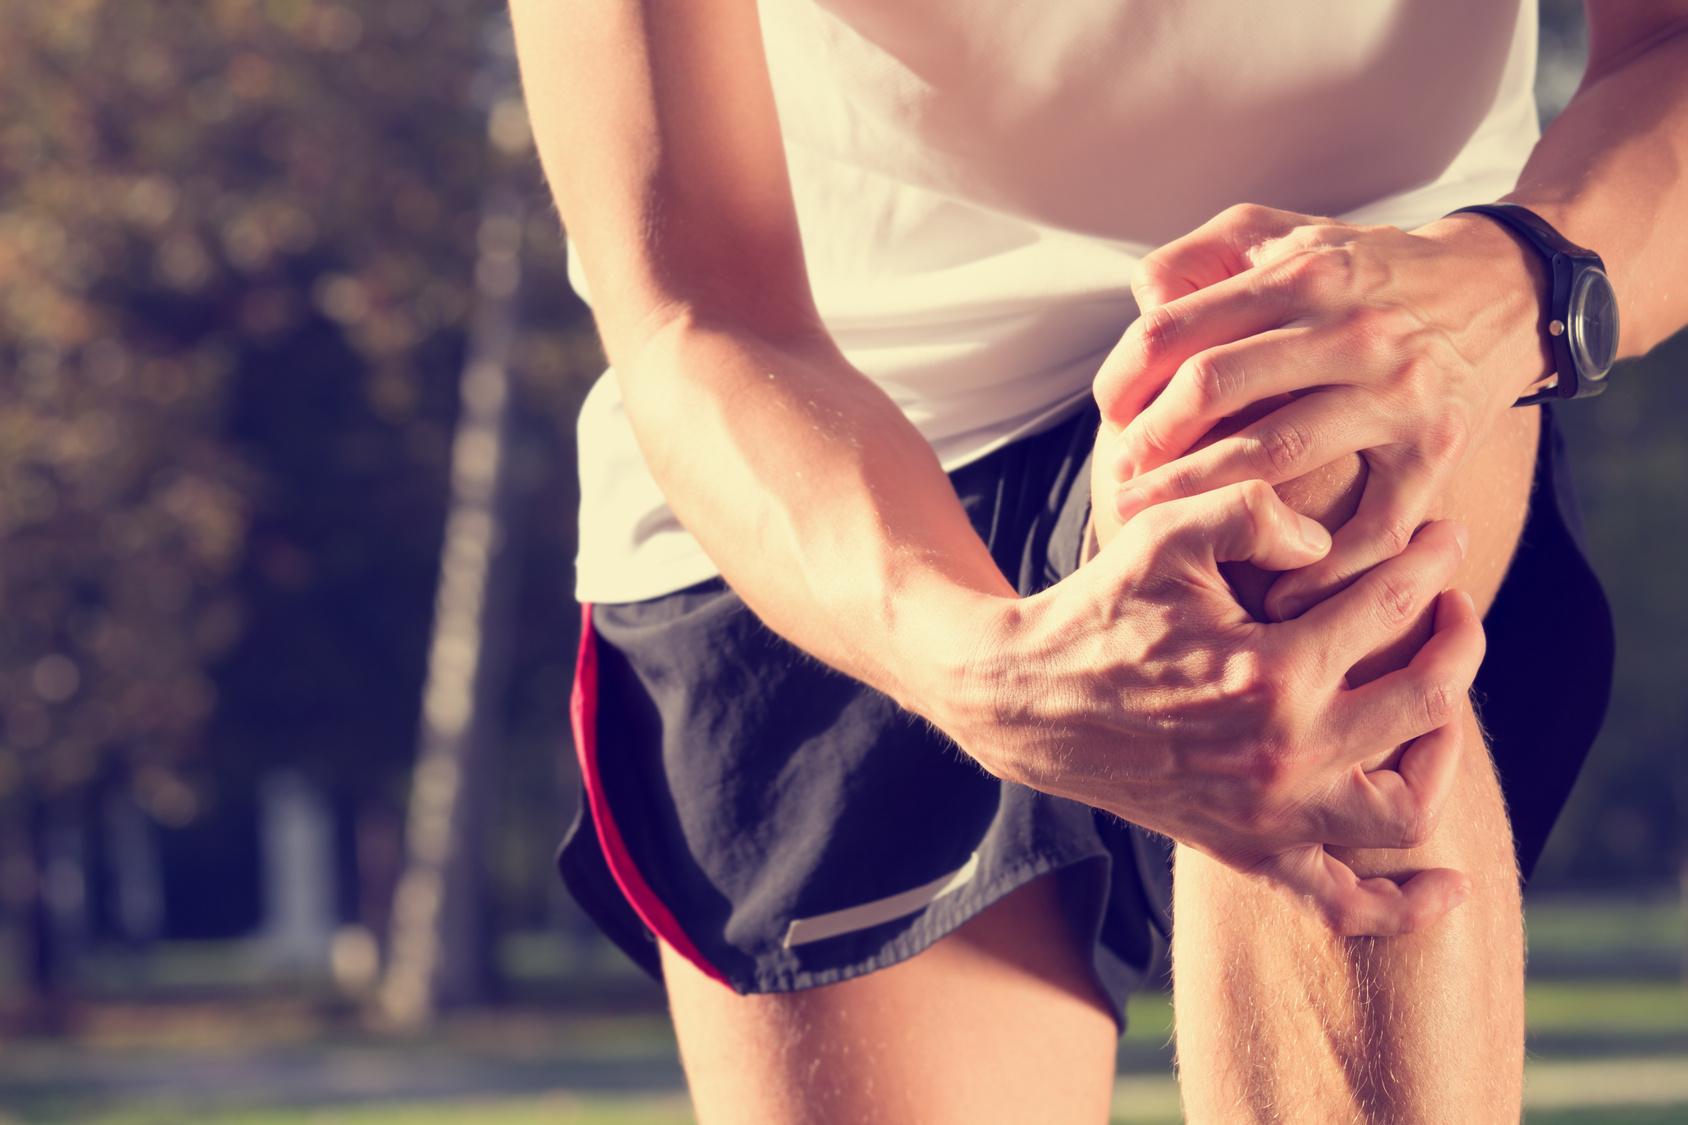 Dolor de rodilla al flexionar